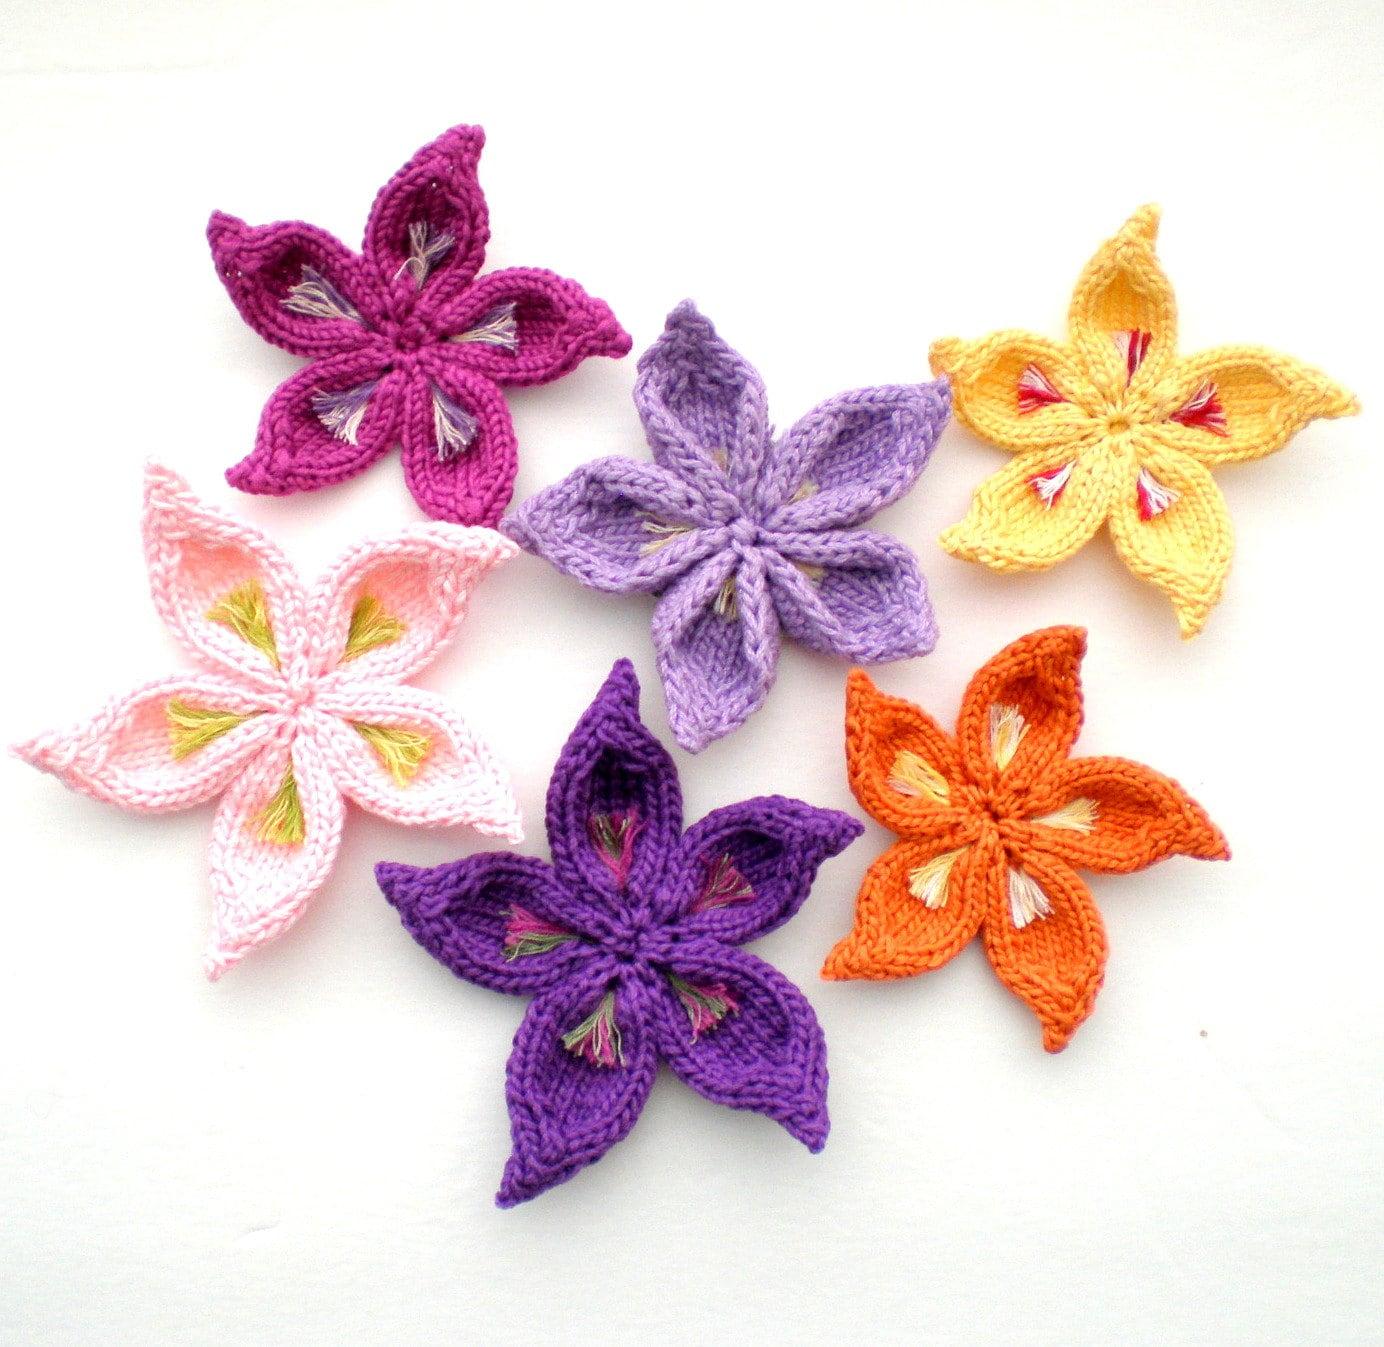 Knit Flower Patterns : PDF Knit Flower Pattern Sakura Flower